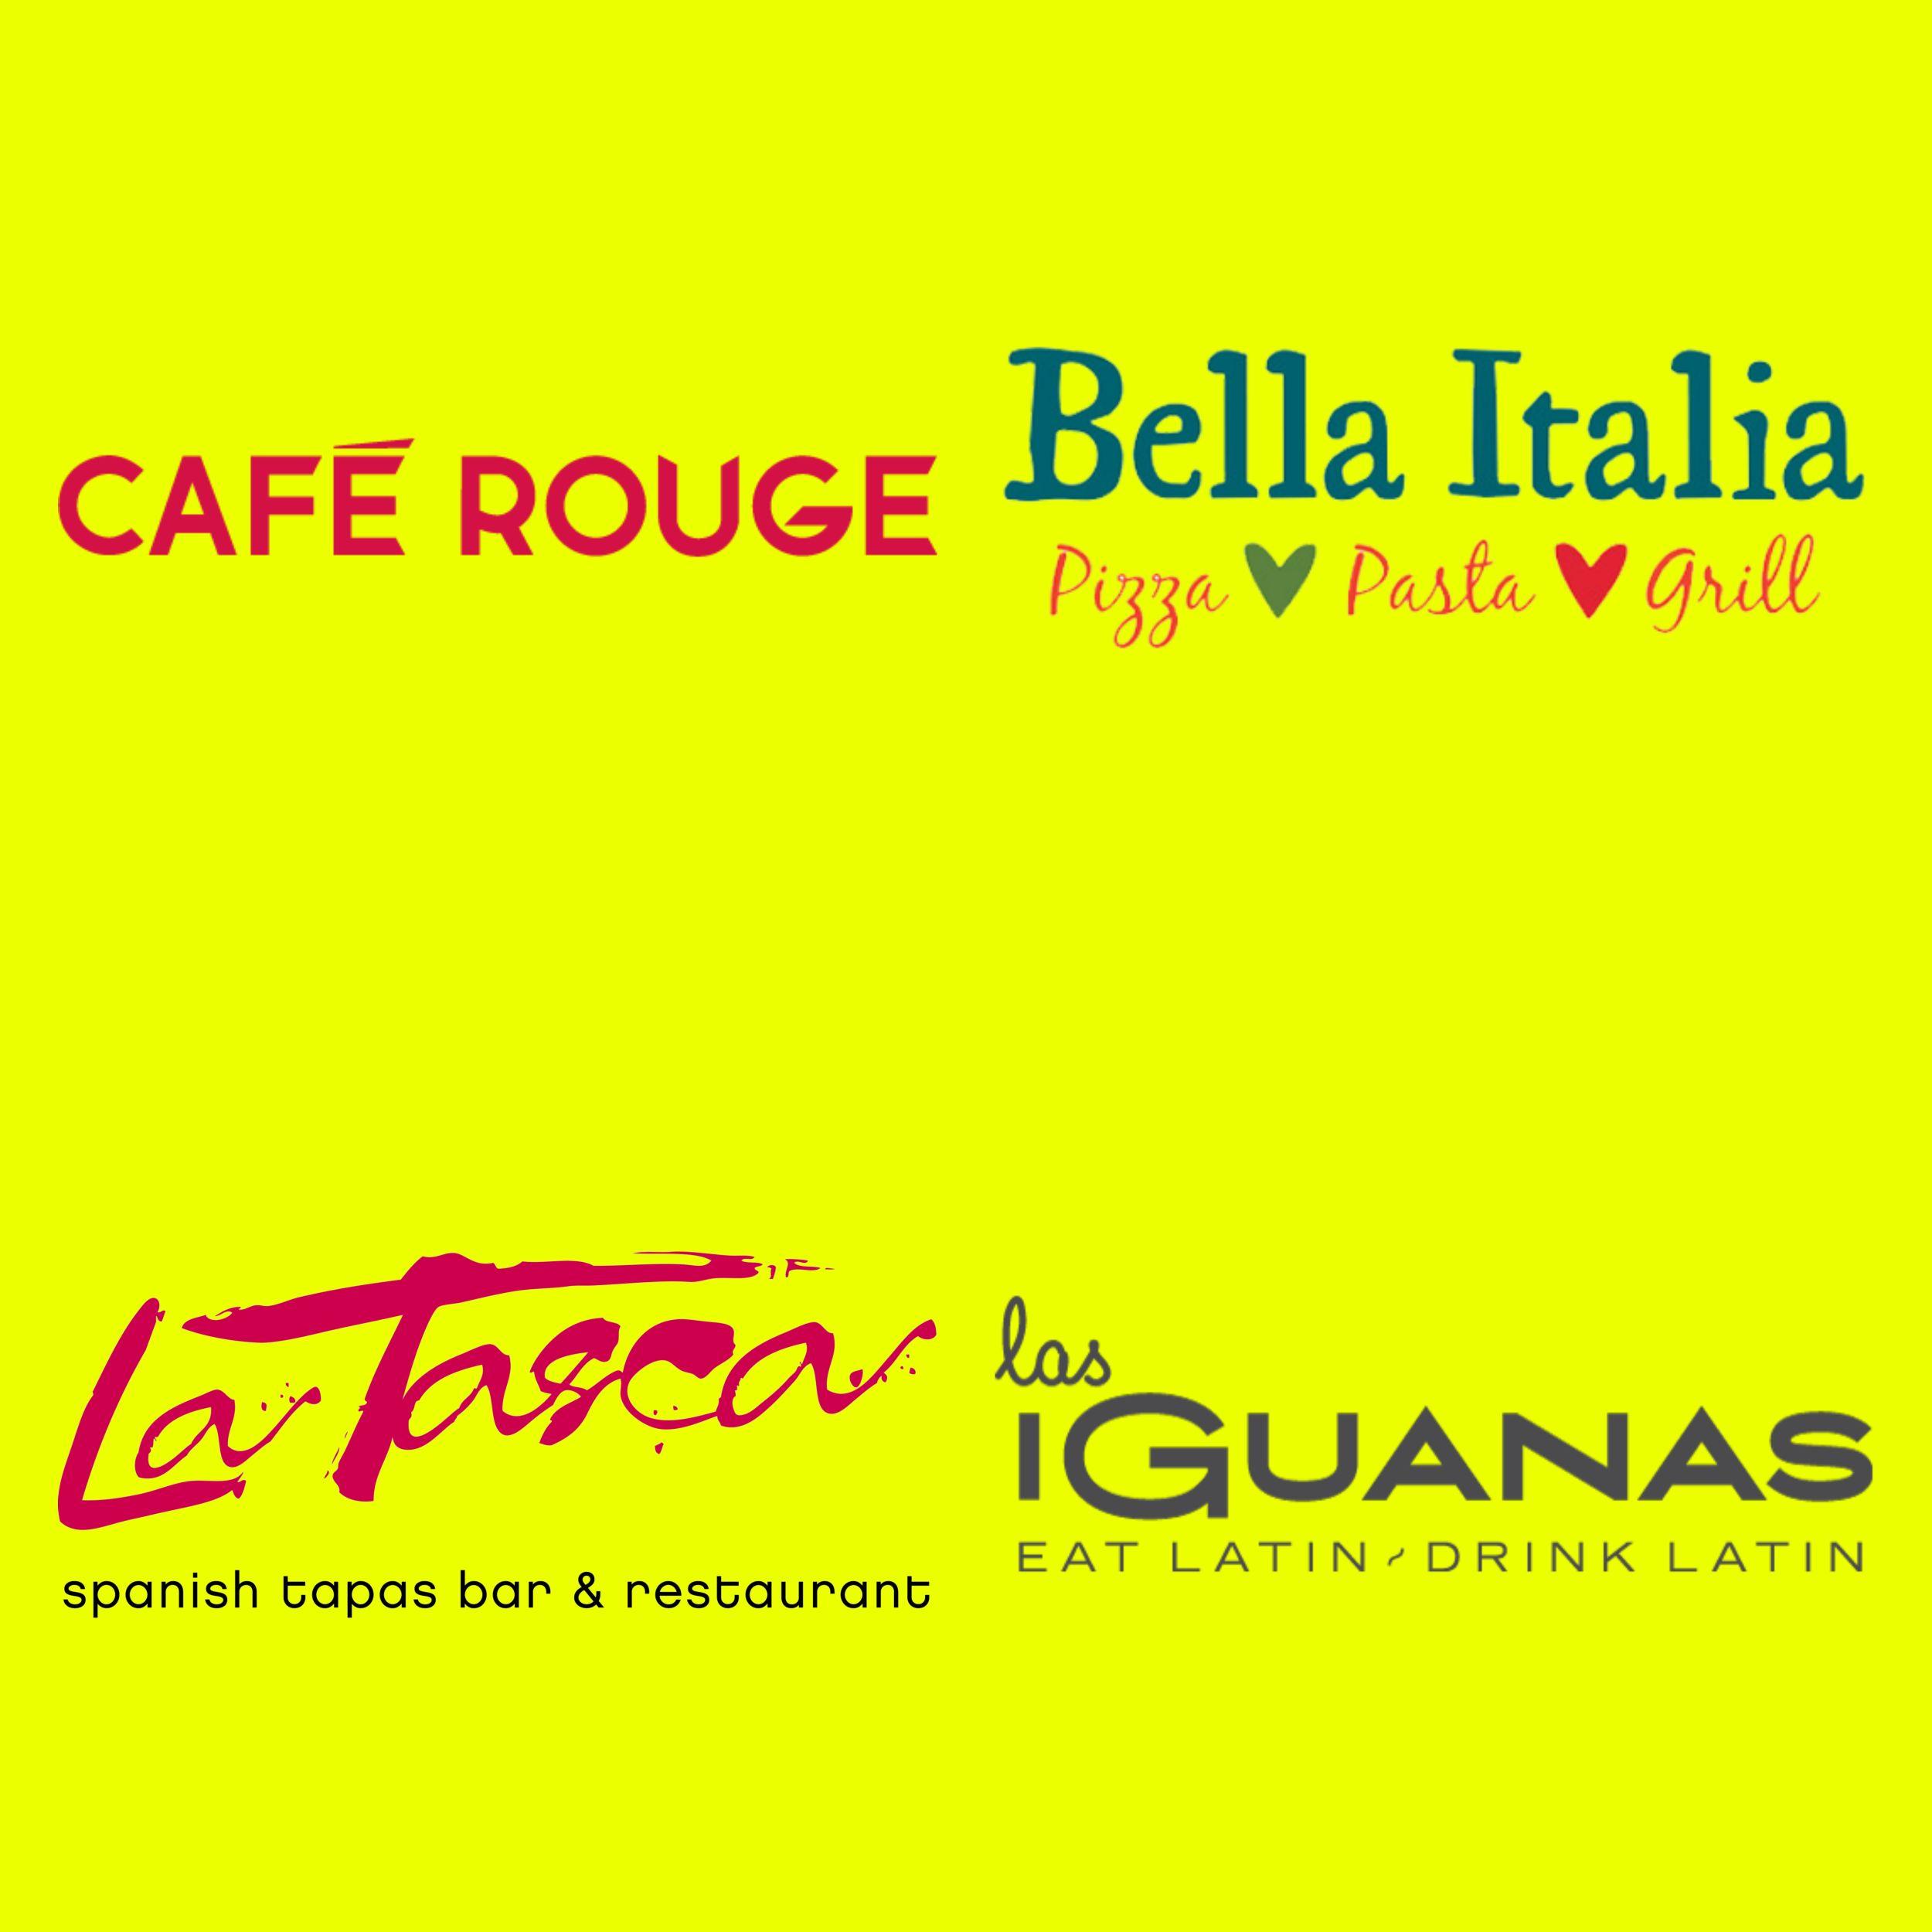 £3 Food at Bella Italia, Café Rouge, La Tasca, and Las Iguanas + Potential Handy Candy @ Wuntu (For Three Customers)